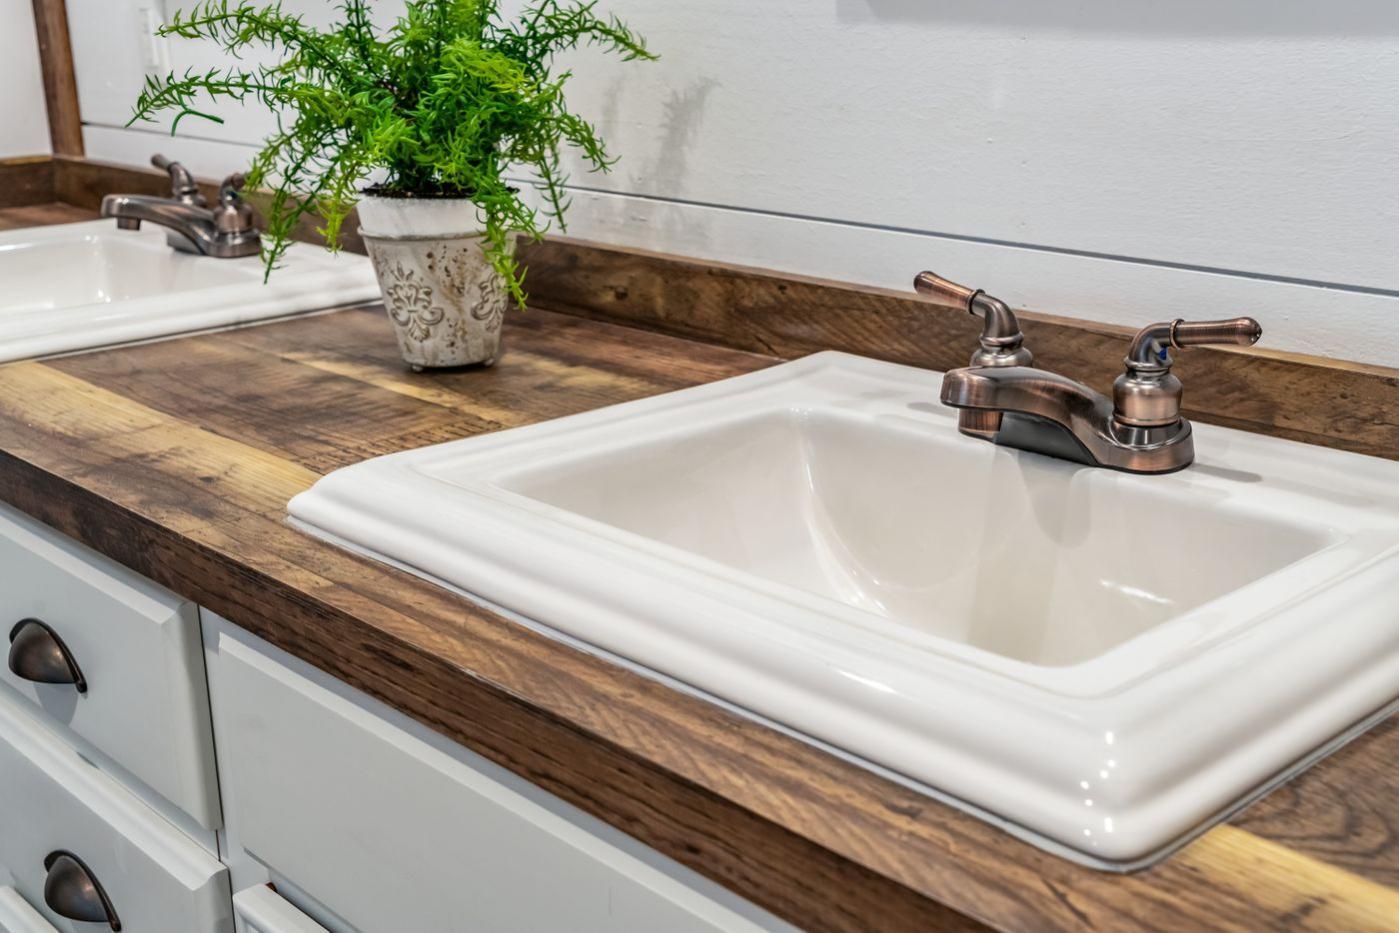 The Avalyn Sink